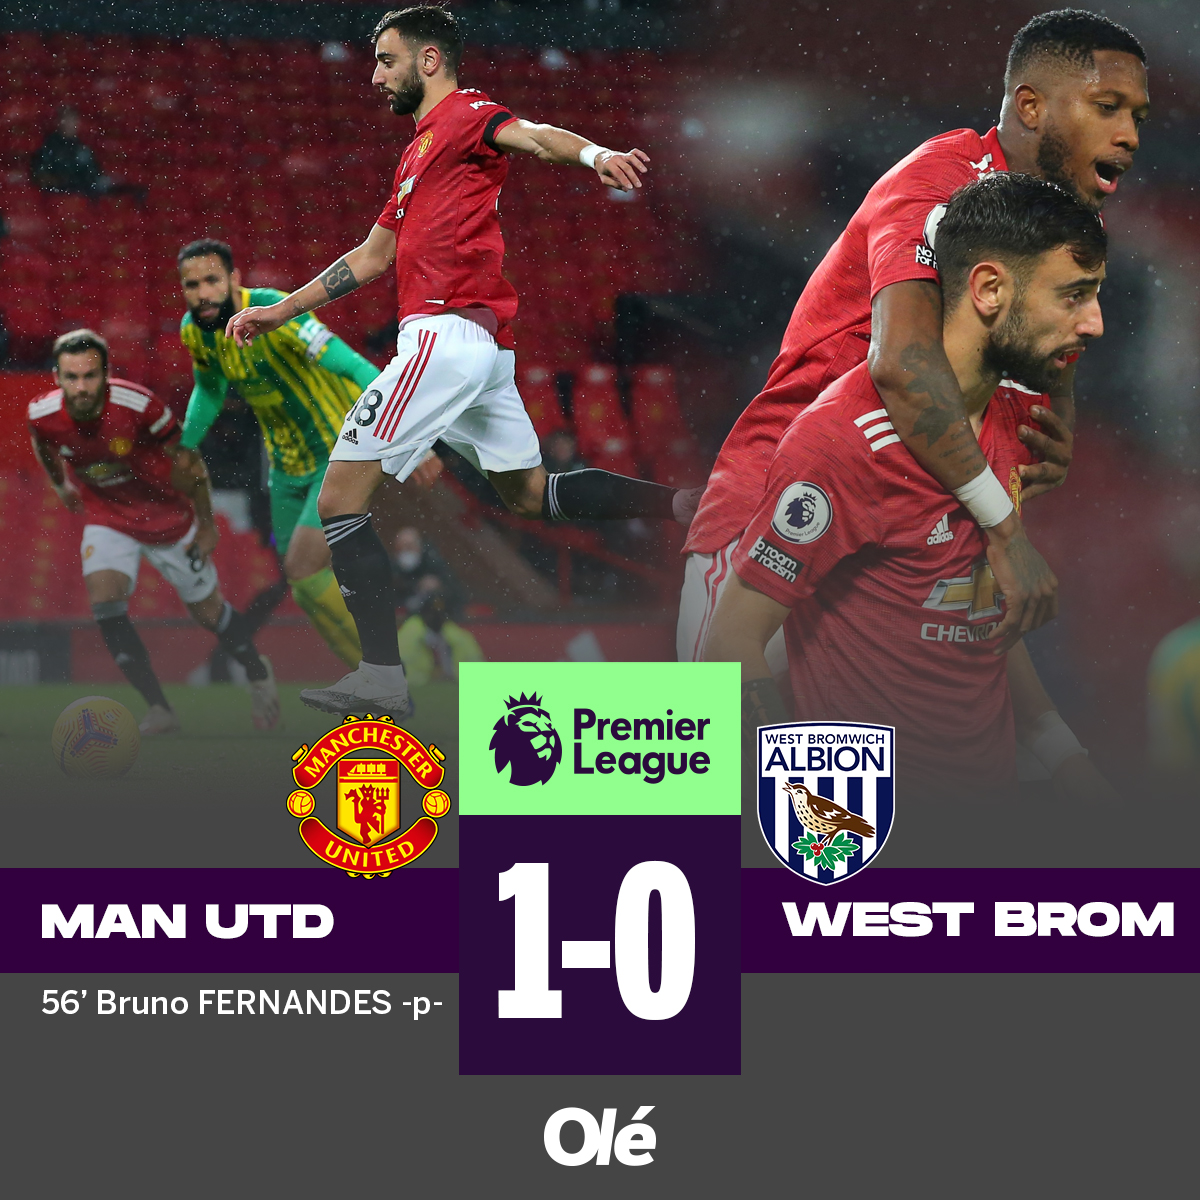 ⚽️🏴 PREMIER LEAGUE  🇦🇷💥 Gol de LO CELSO para el 2-0 de Tottenham vs. Manchester City. 🇵🇹 Manchester United ganó 1-0 (Bruno Fernandes de penal). 👎 Chelsea le ganó 2-0 a Newcastle (gol e/c de Fede Fernández).  🧤 Emi Martínez atajó en la derrota 2-1 de Aston Villa ante Brighton. https://t.co/kU3PFU3tUq